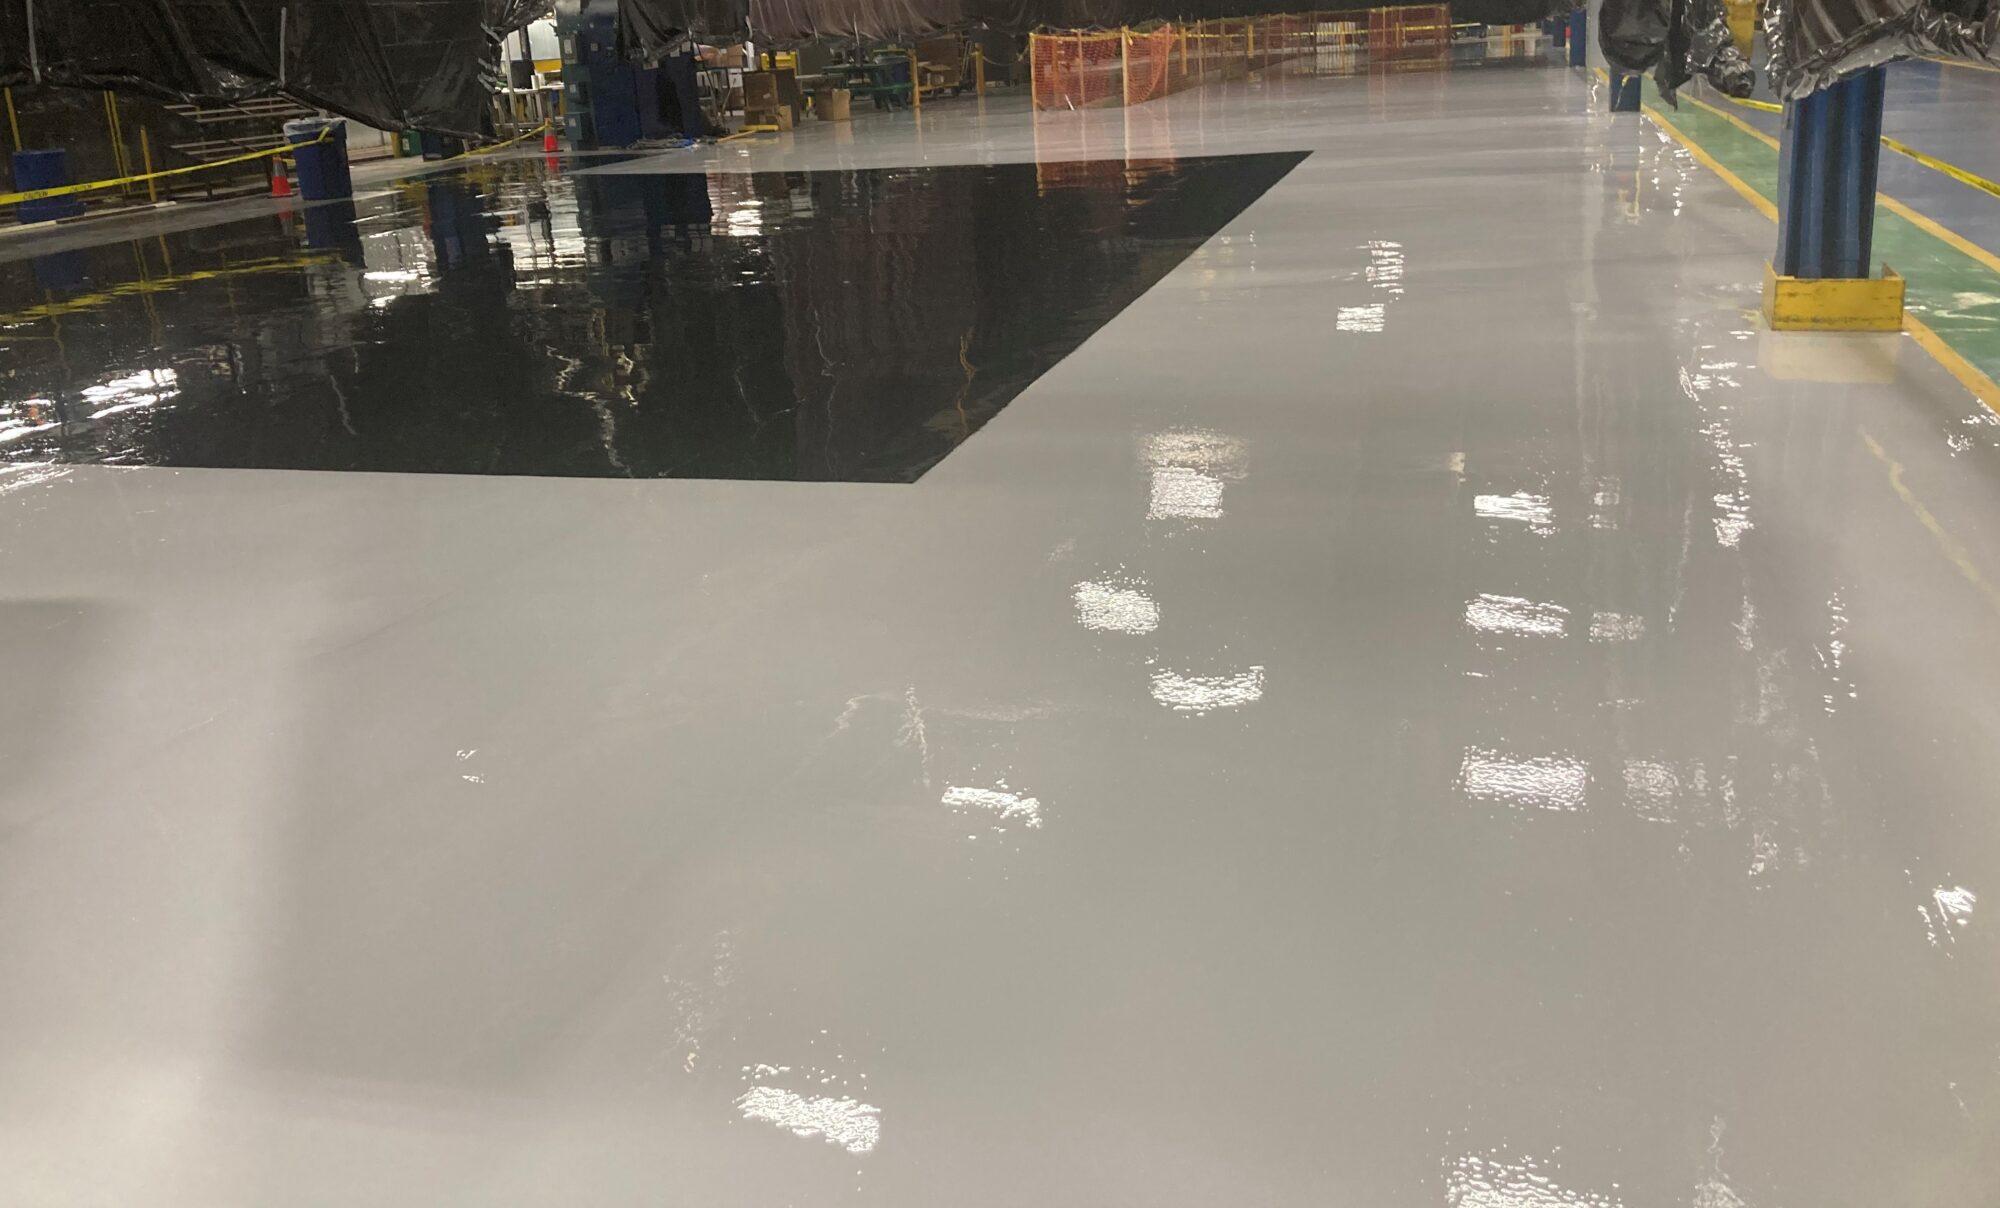 #industrialapplicationsinc #concretefloorcoatings #epoxyfloorcoating #epoxycoatings #industrialconcretefloors #epoxyfloorcoatings #TeamIA #5SMarkings #floorsafetystriping